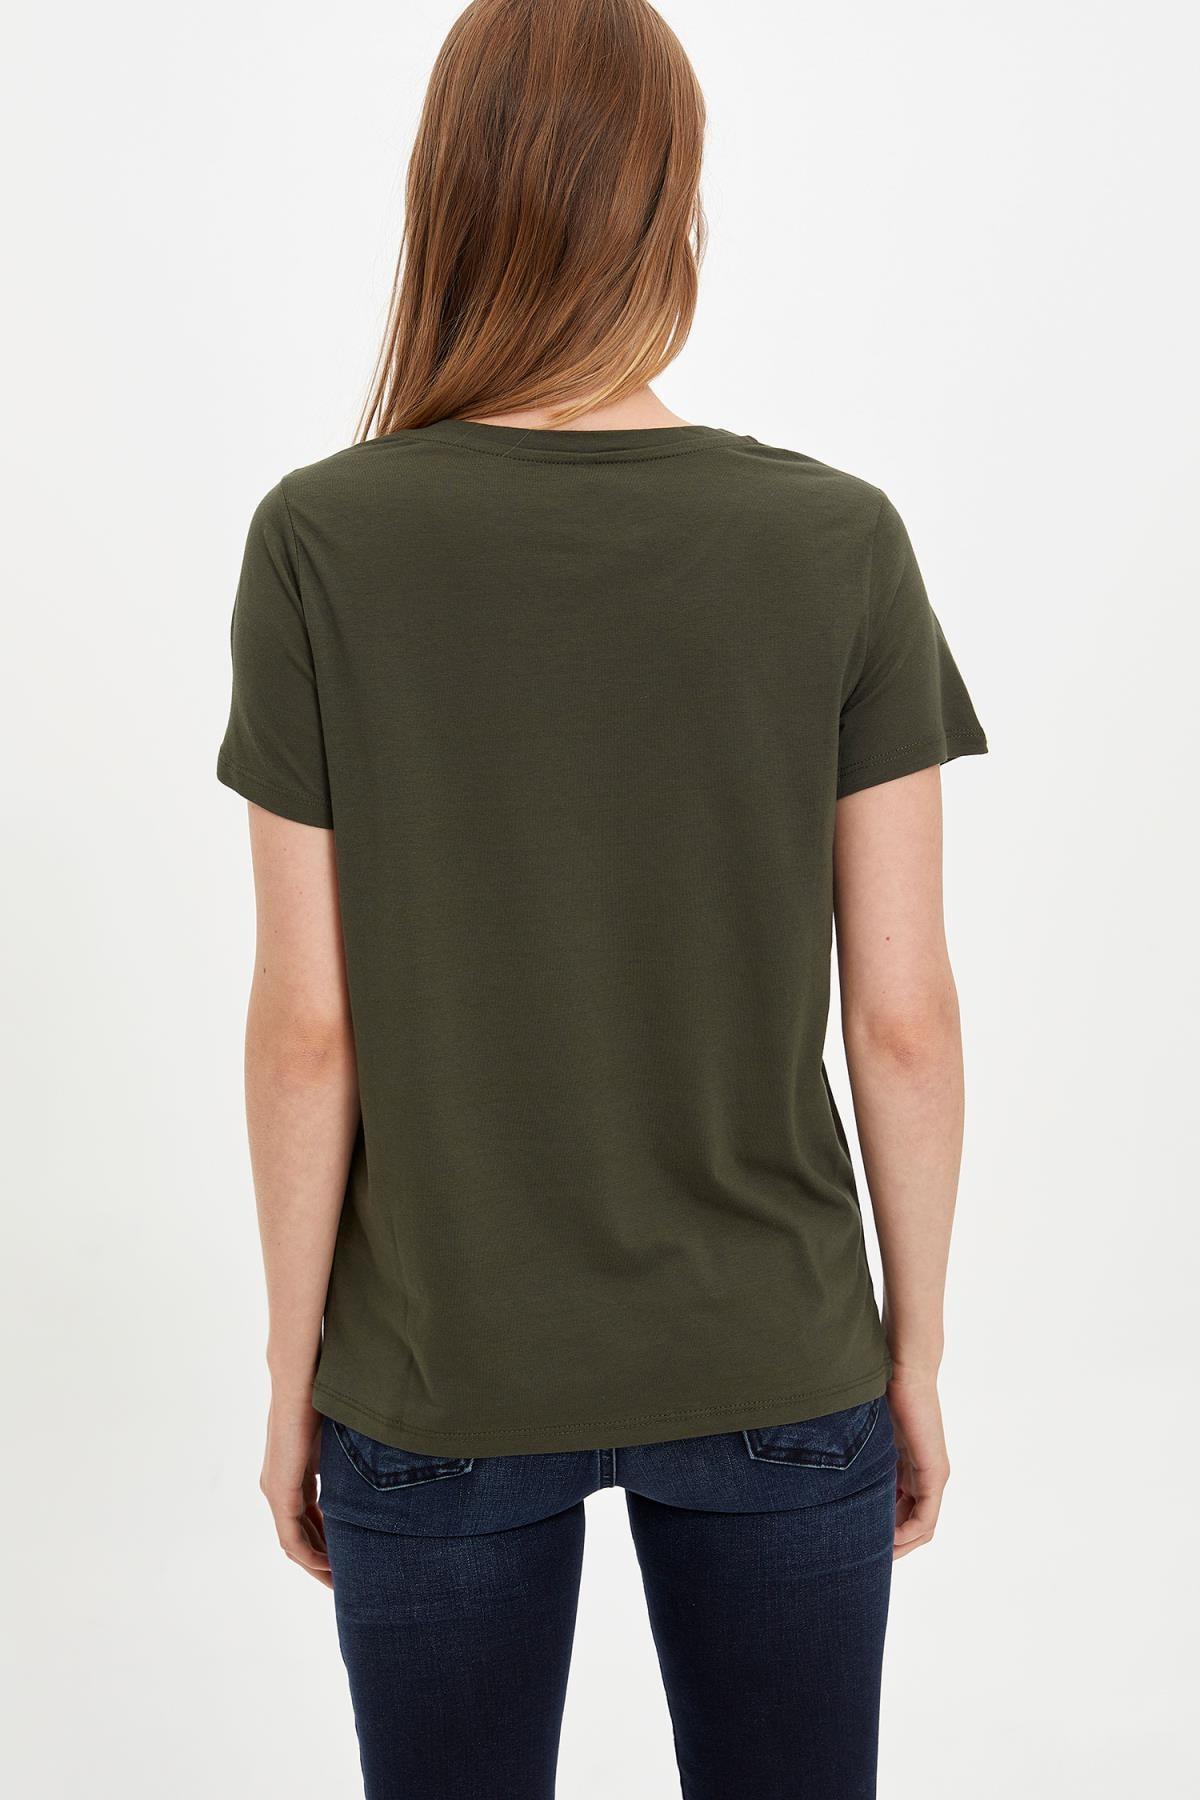 Defacto Kadın Haki Kısa Kollu T-shirt L6533AZ.19AU.KH211 4